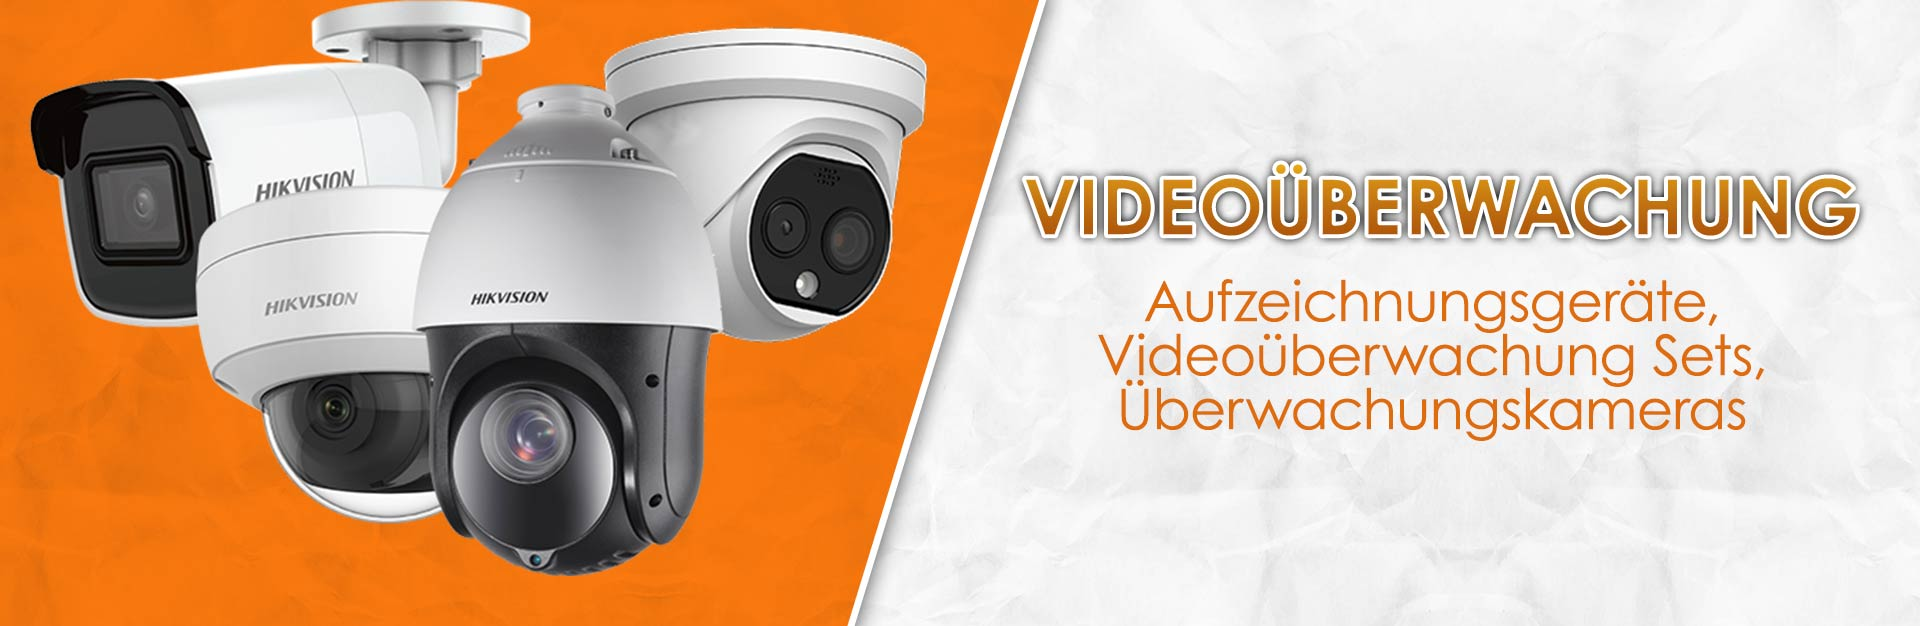 Videoueberwachung-Set-Kameraueberwachung-Security-Objektsicherheit-OrangeComputer-HD